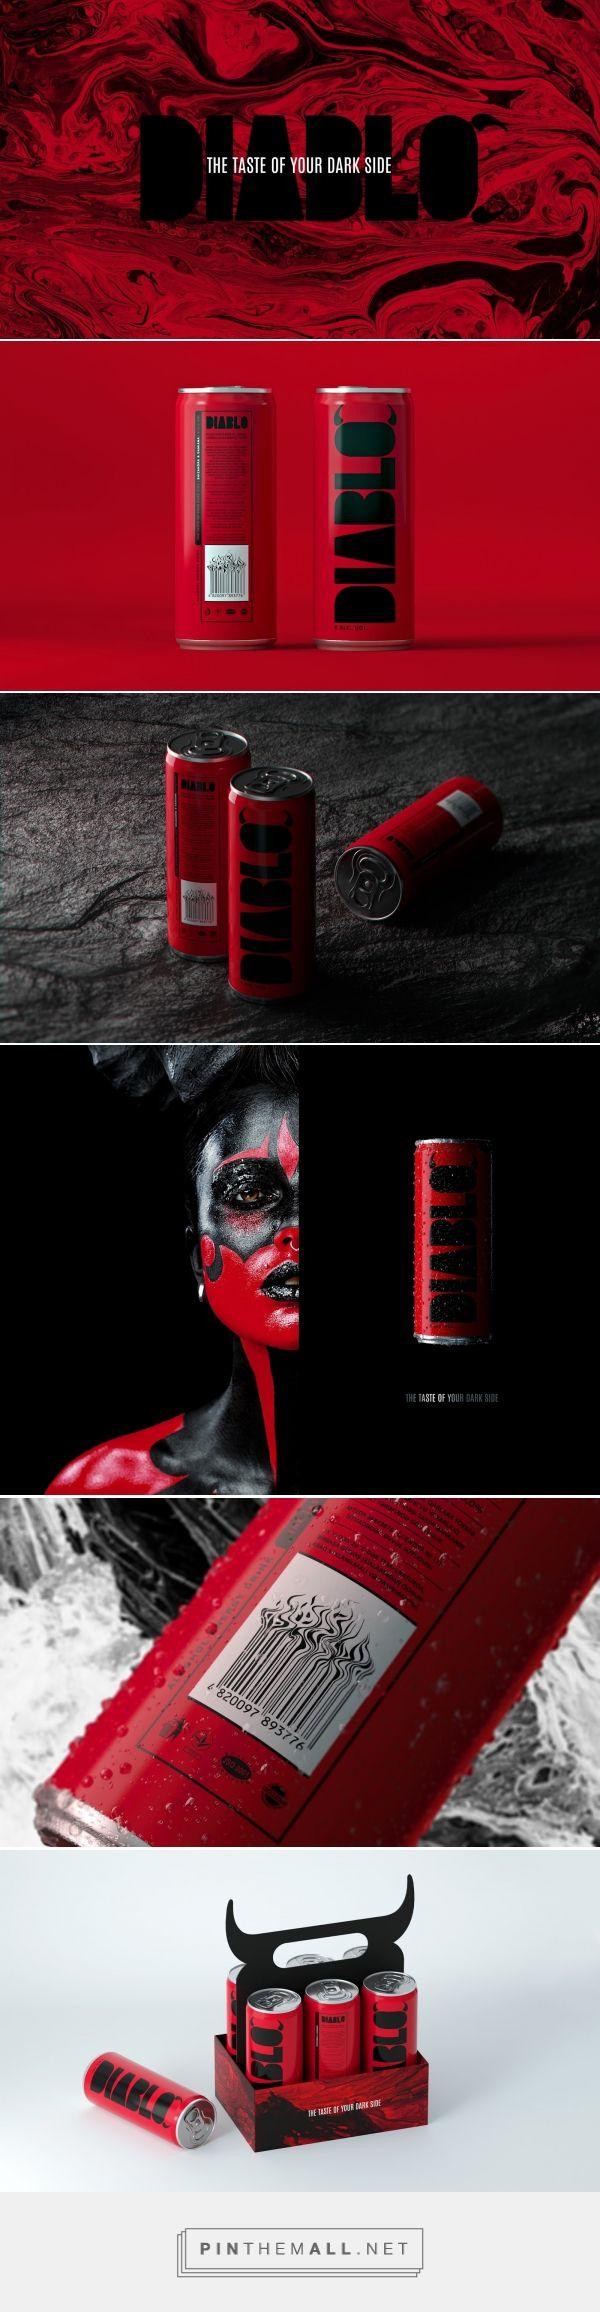 Diablo Alcoholic Energy Drink packaging design by Tough Slate Design (Ukraine) - http://www.packagingoftheworld.com/2016/09/diablo-alcoholic-energy-drink.html